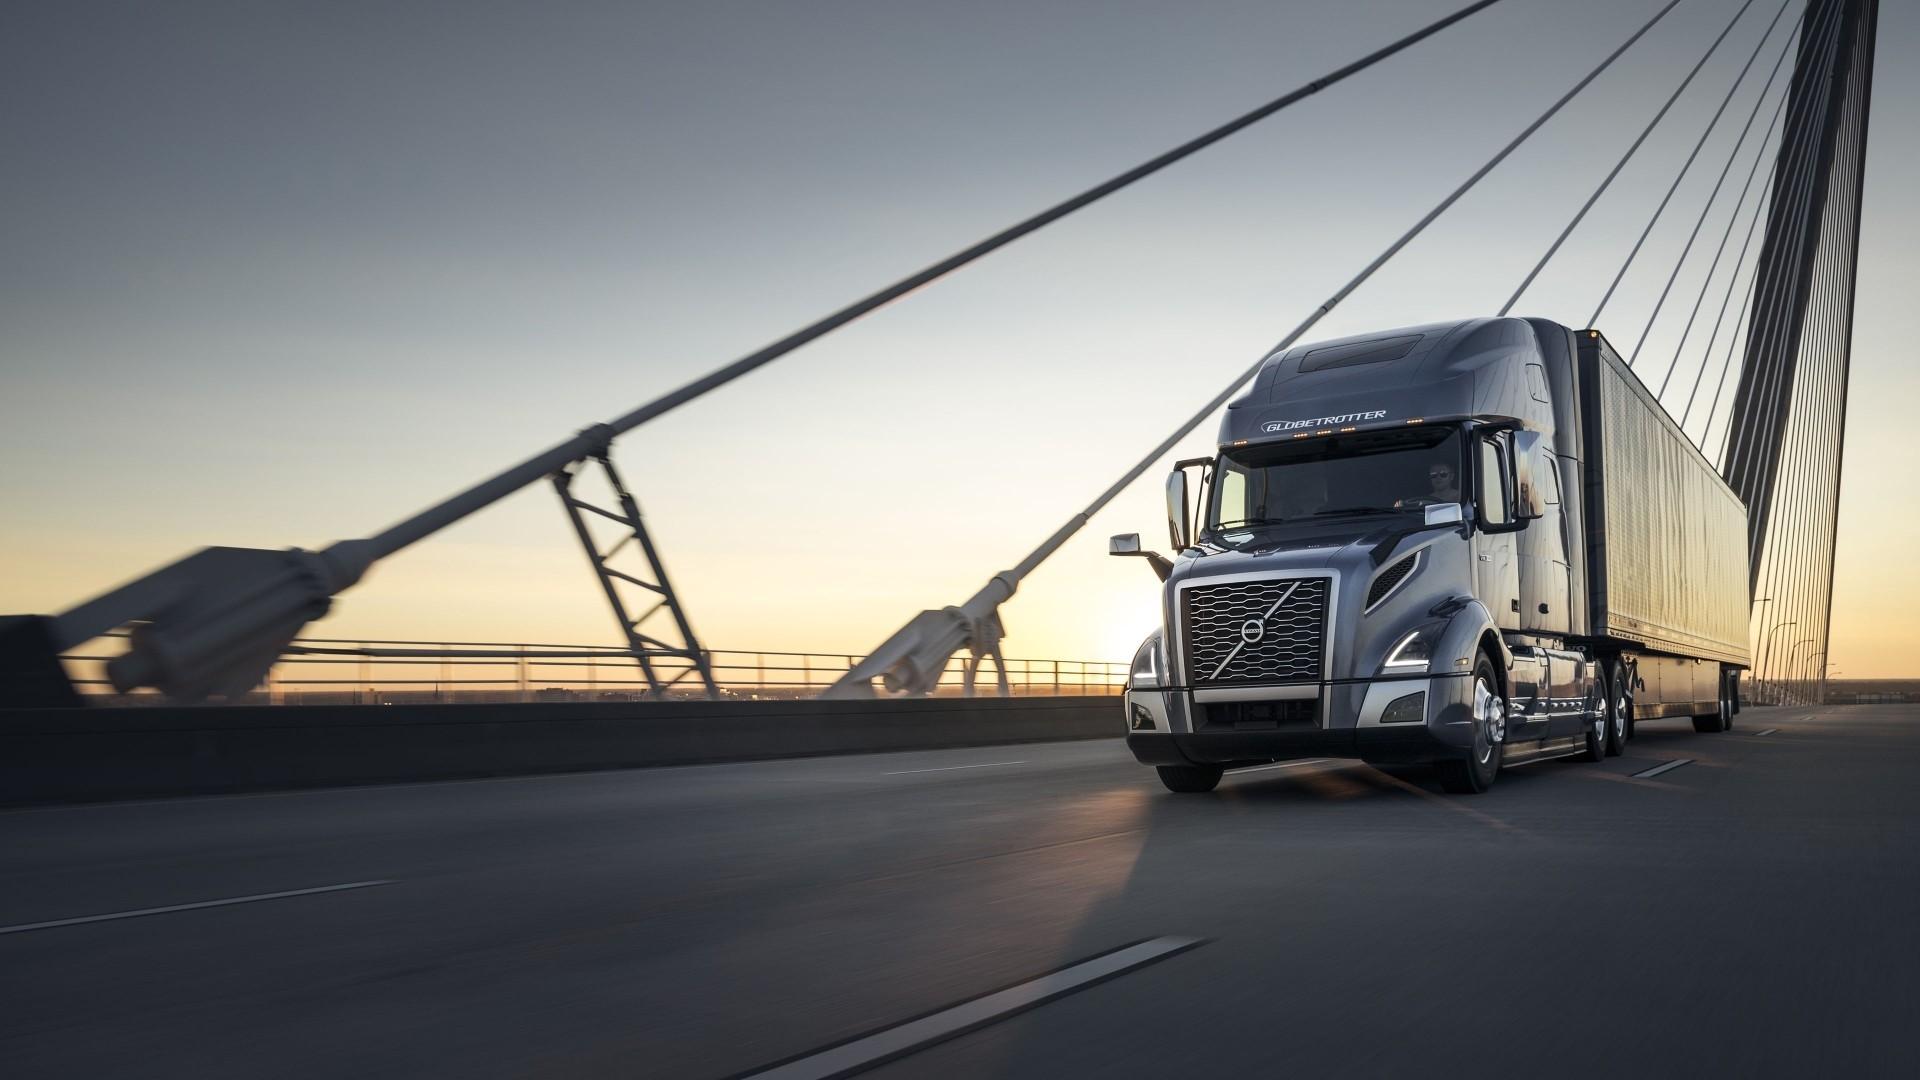 Truck Desktop Wallpaper